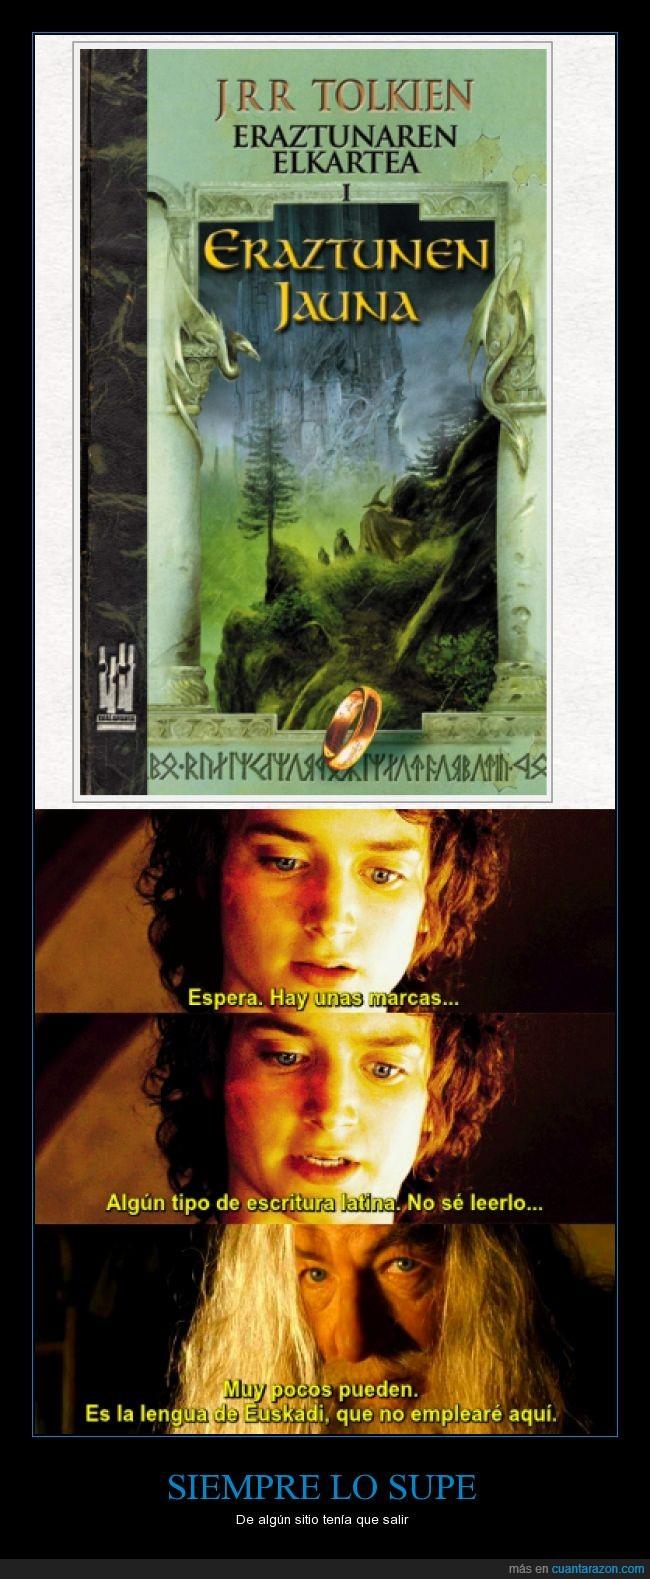 el señor de los anillos,Euskadi,euskera,frodo,gandalf,vasco